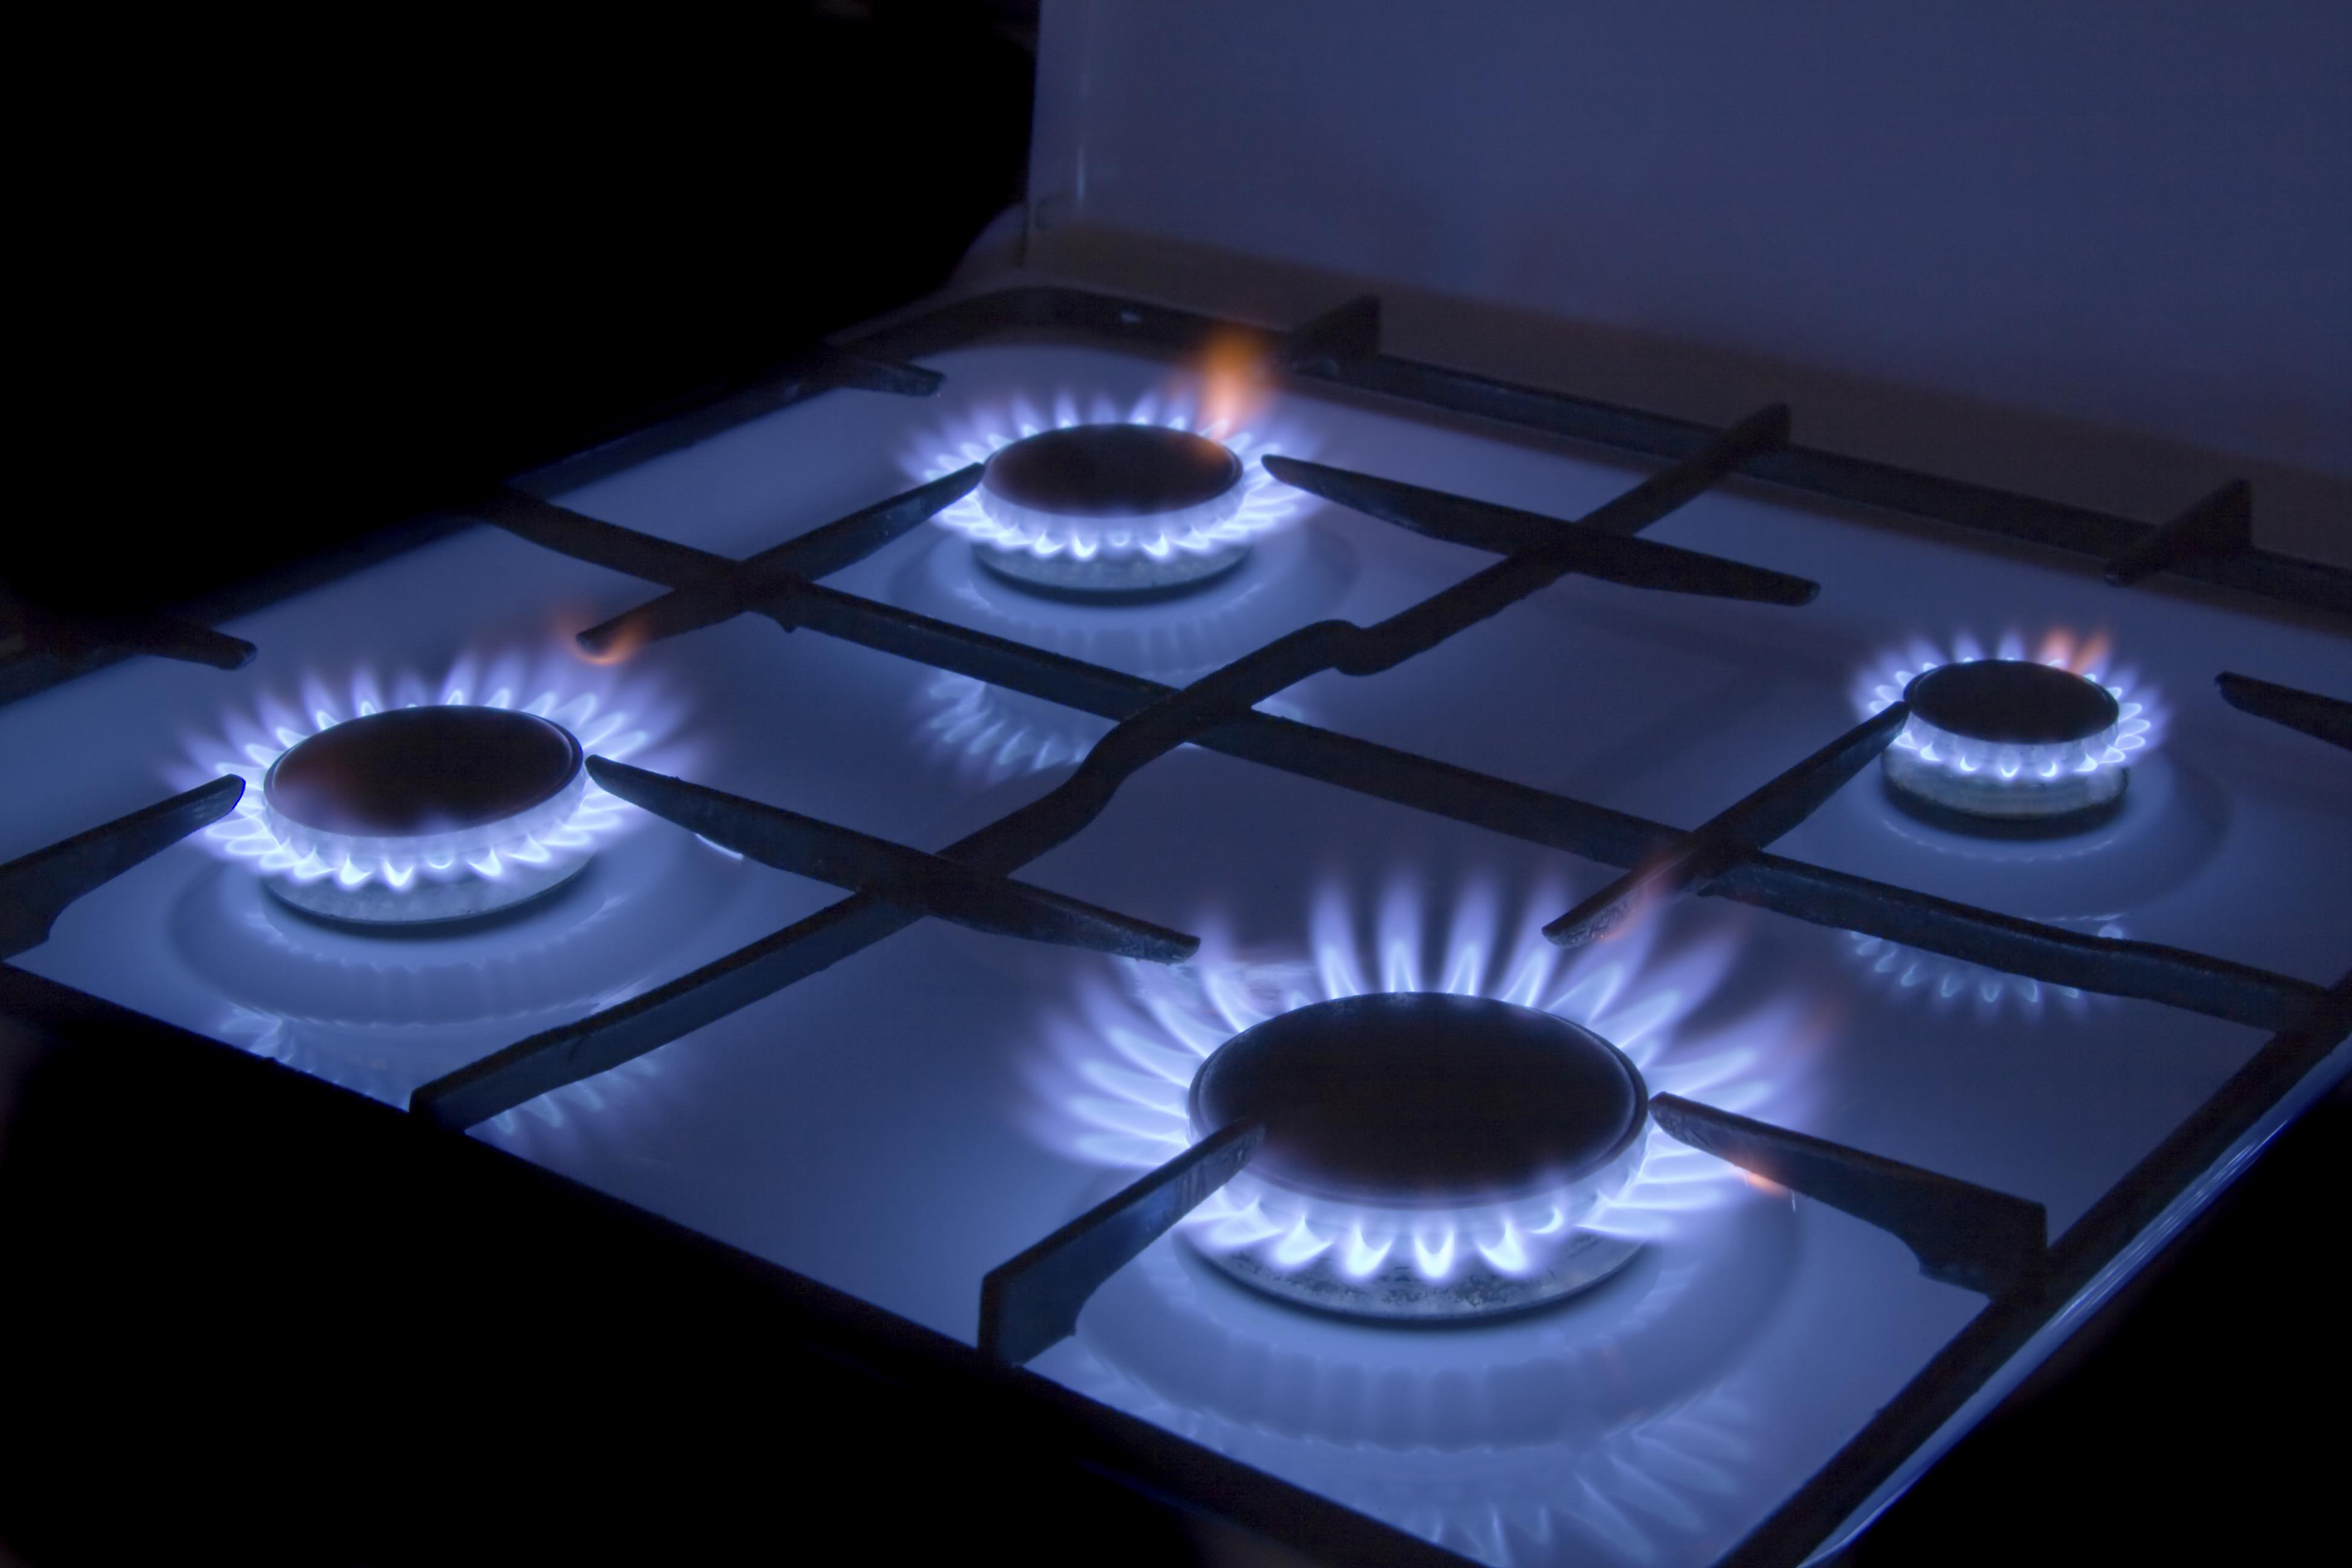 Подача газа в многоквартирном доме приостановлена